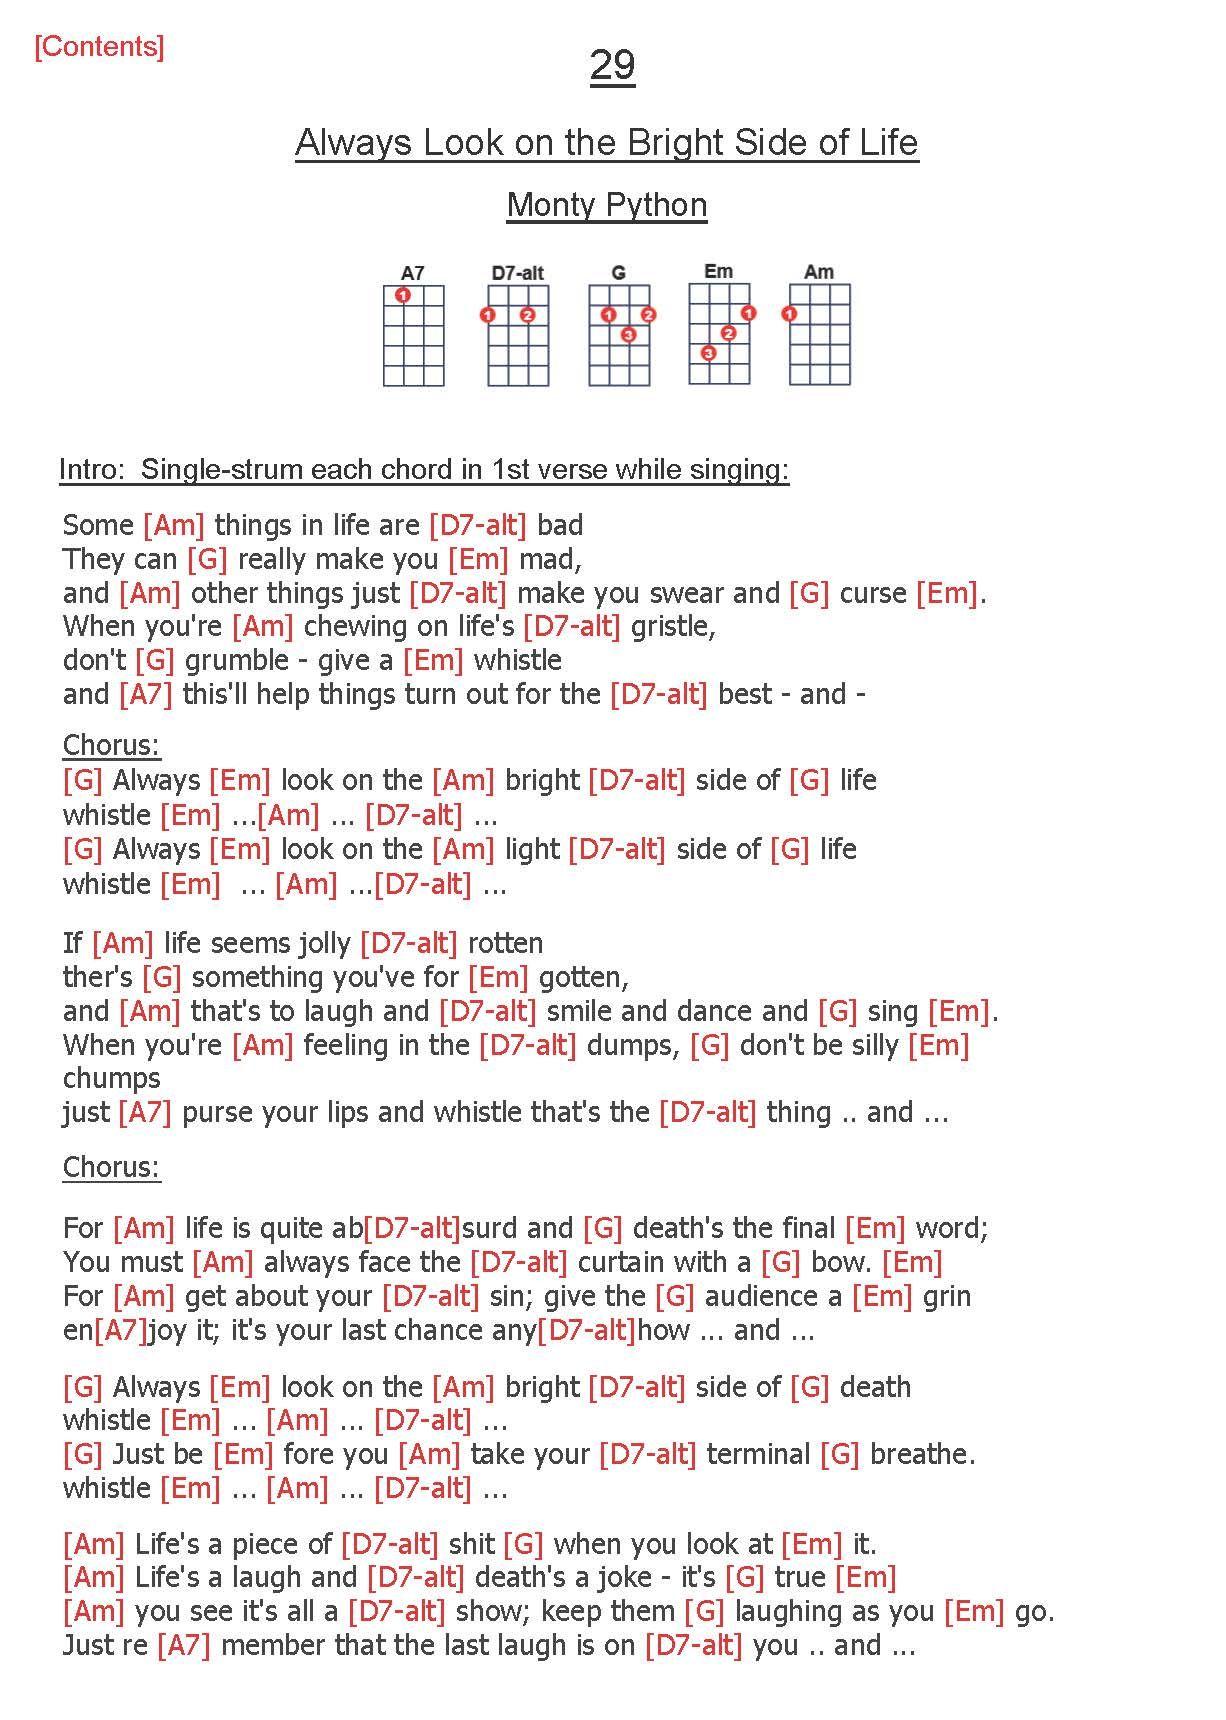 Pin By Ed On Music Ukulele Chords Songs Music Manuscript Monty